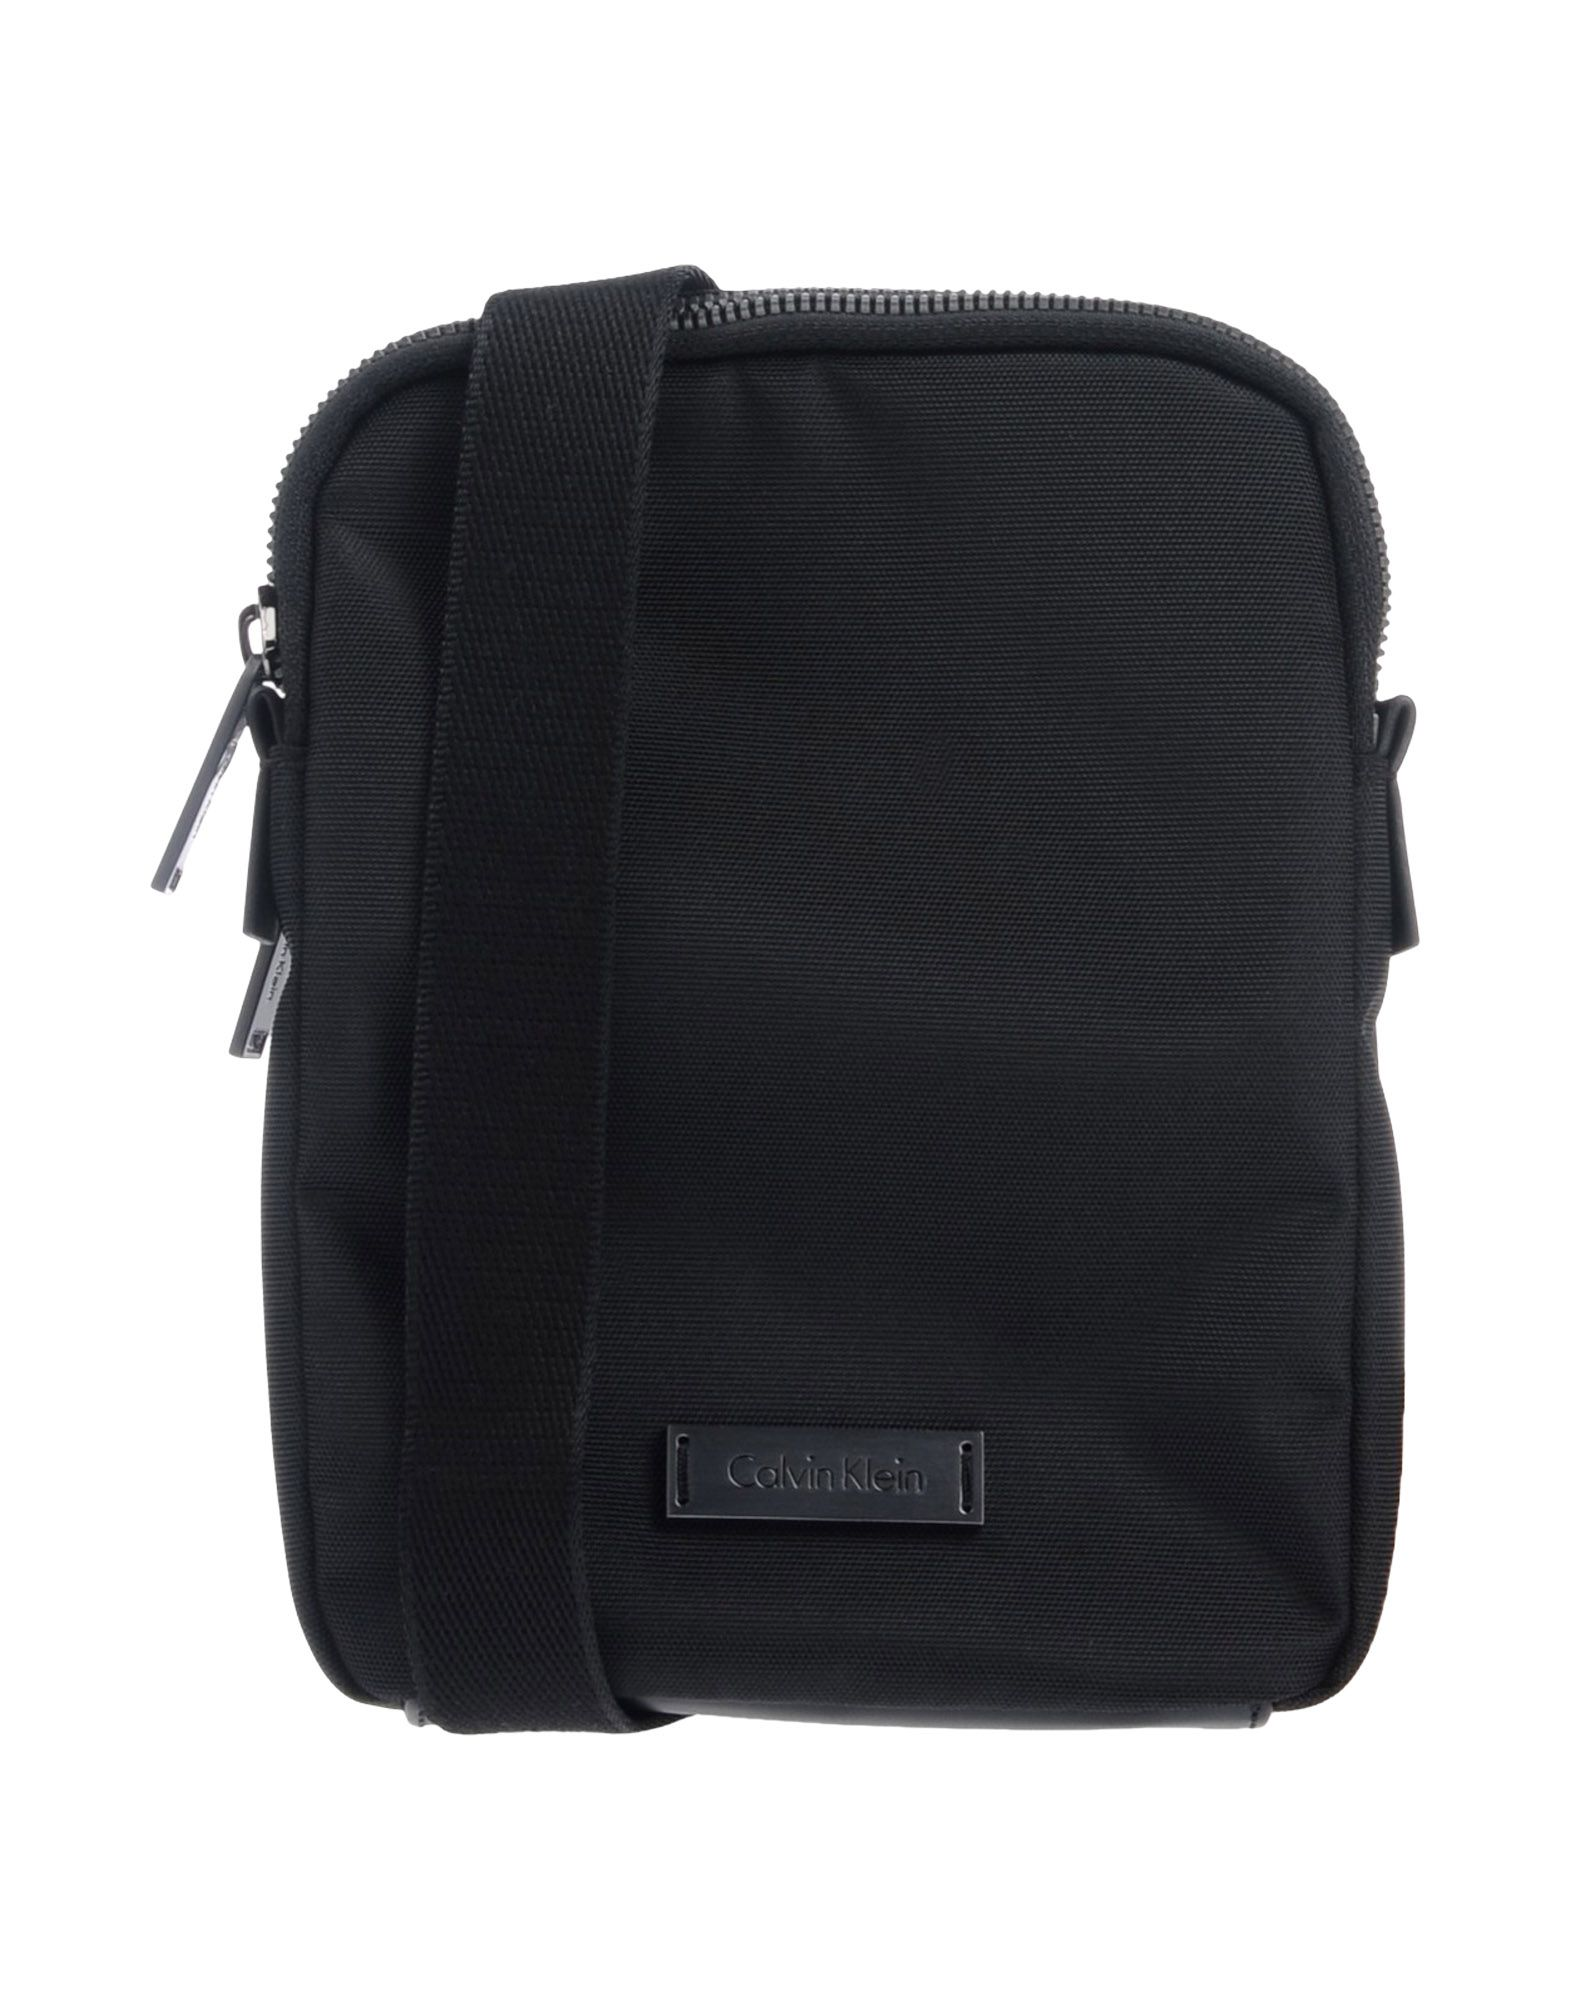 1573976bb2 Τσάντα Ταχυδρόμου Calvin Klein Άνδρας - Τσάντες Ταχυδρόμου Calvin Klein στο  YOOX - 45419626RC